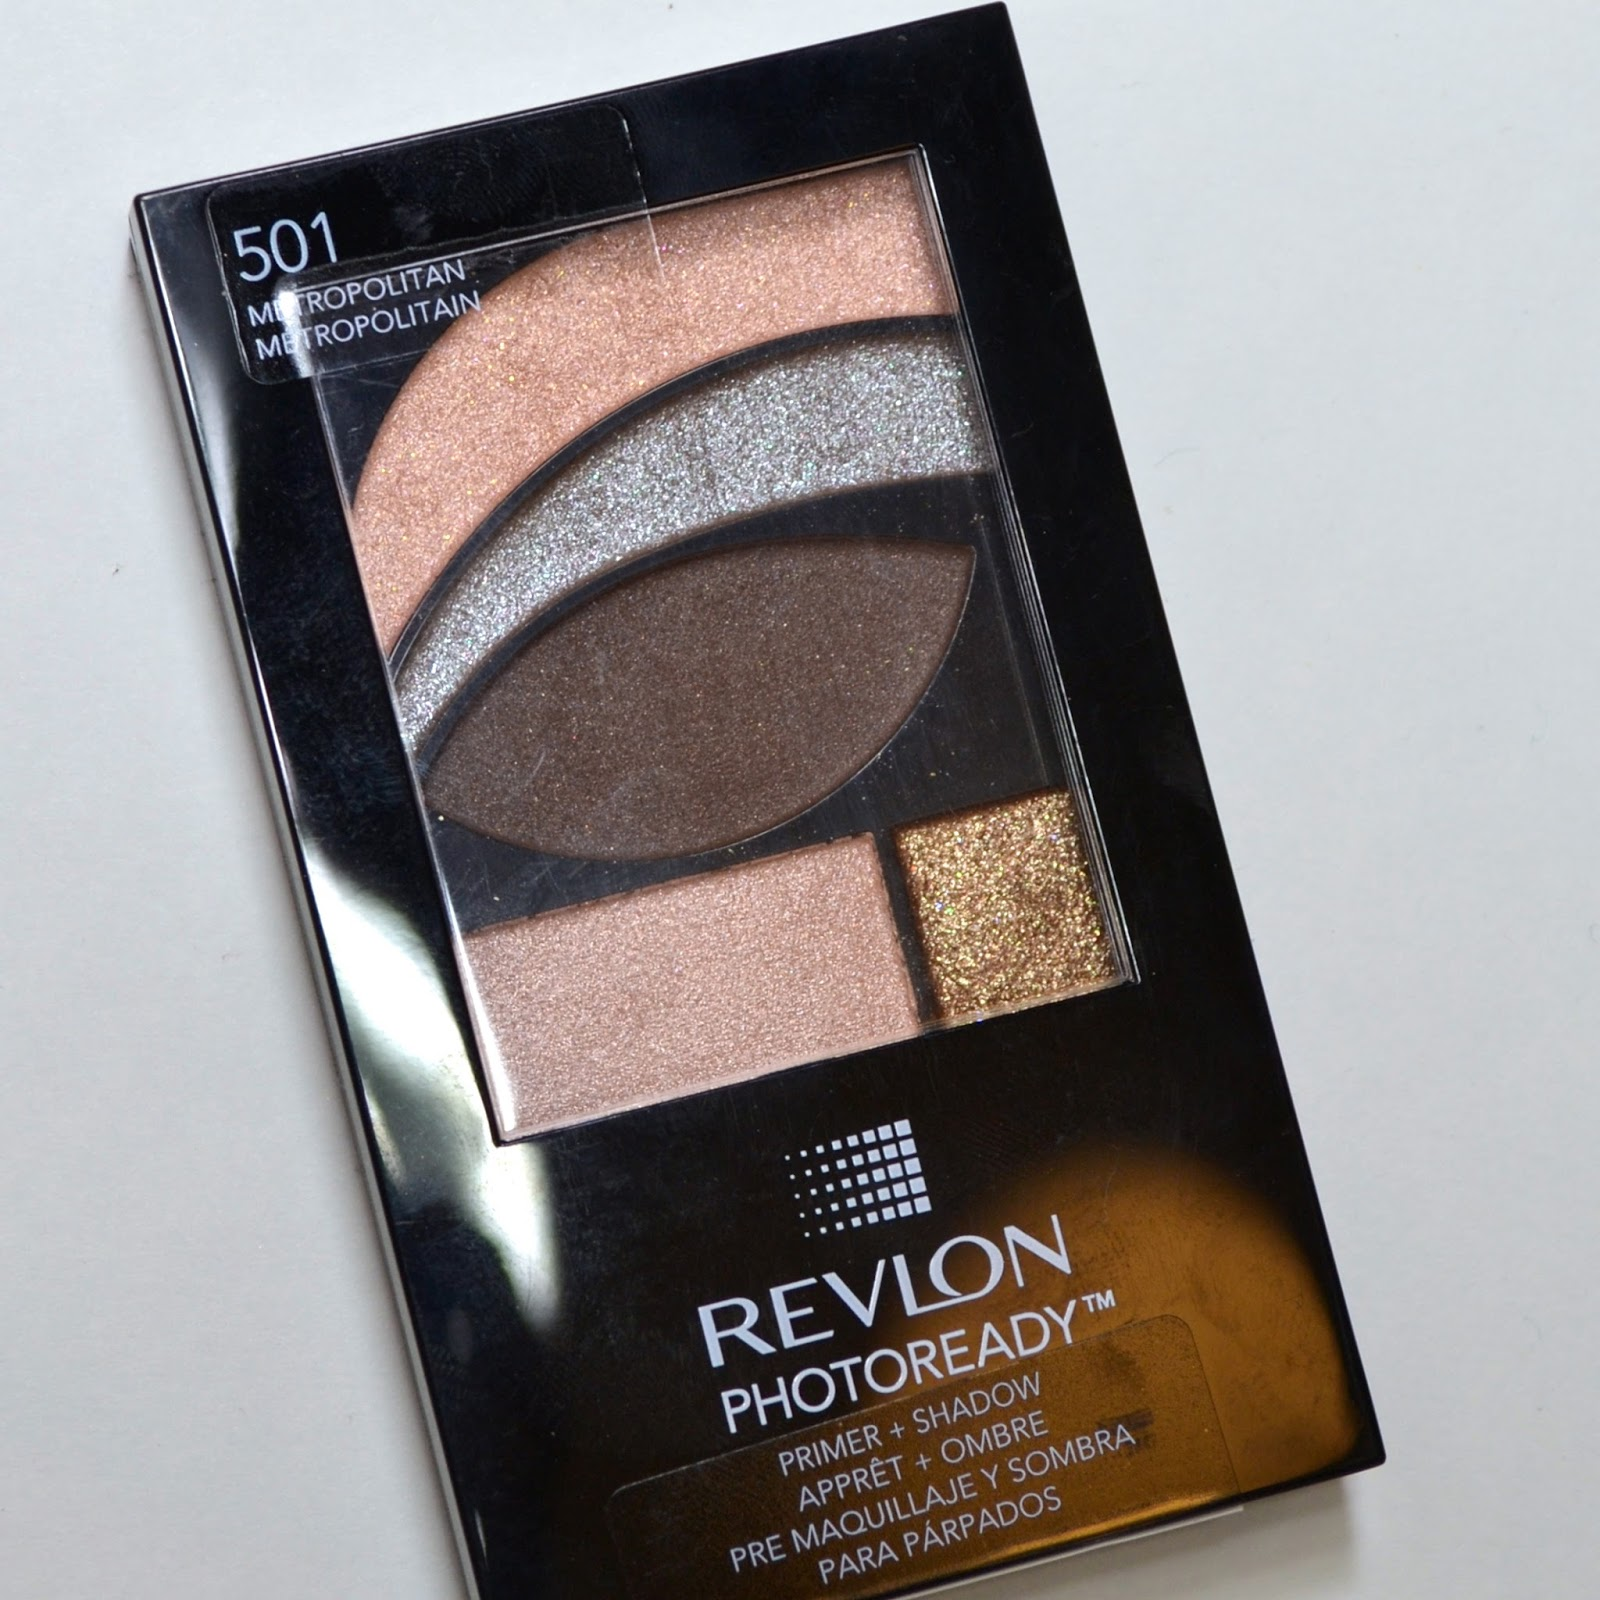 PhotoReady Perfecting Primer by Revlon #19